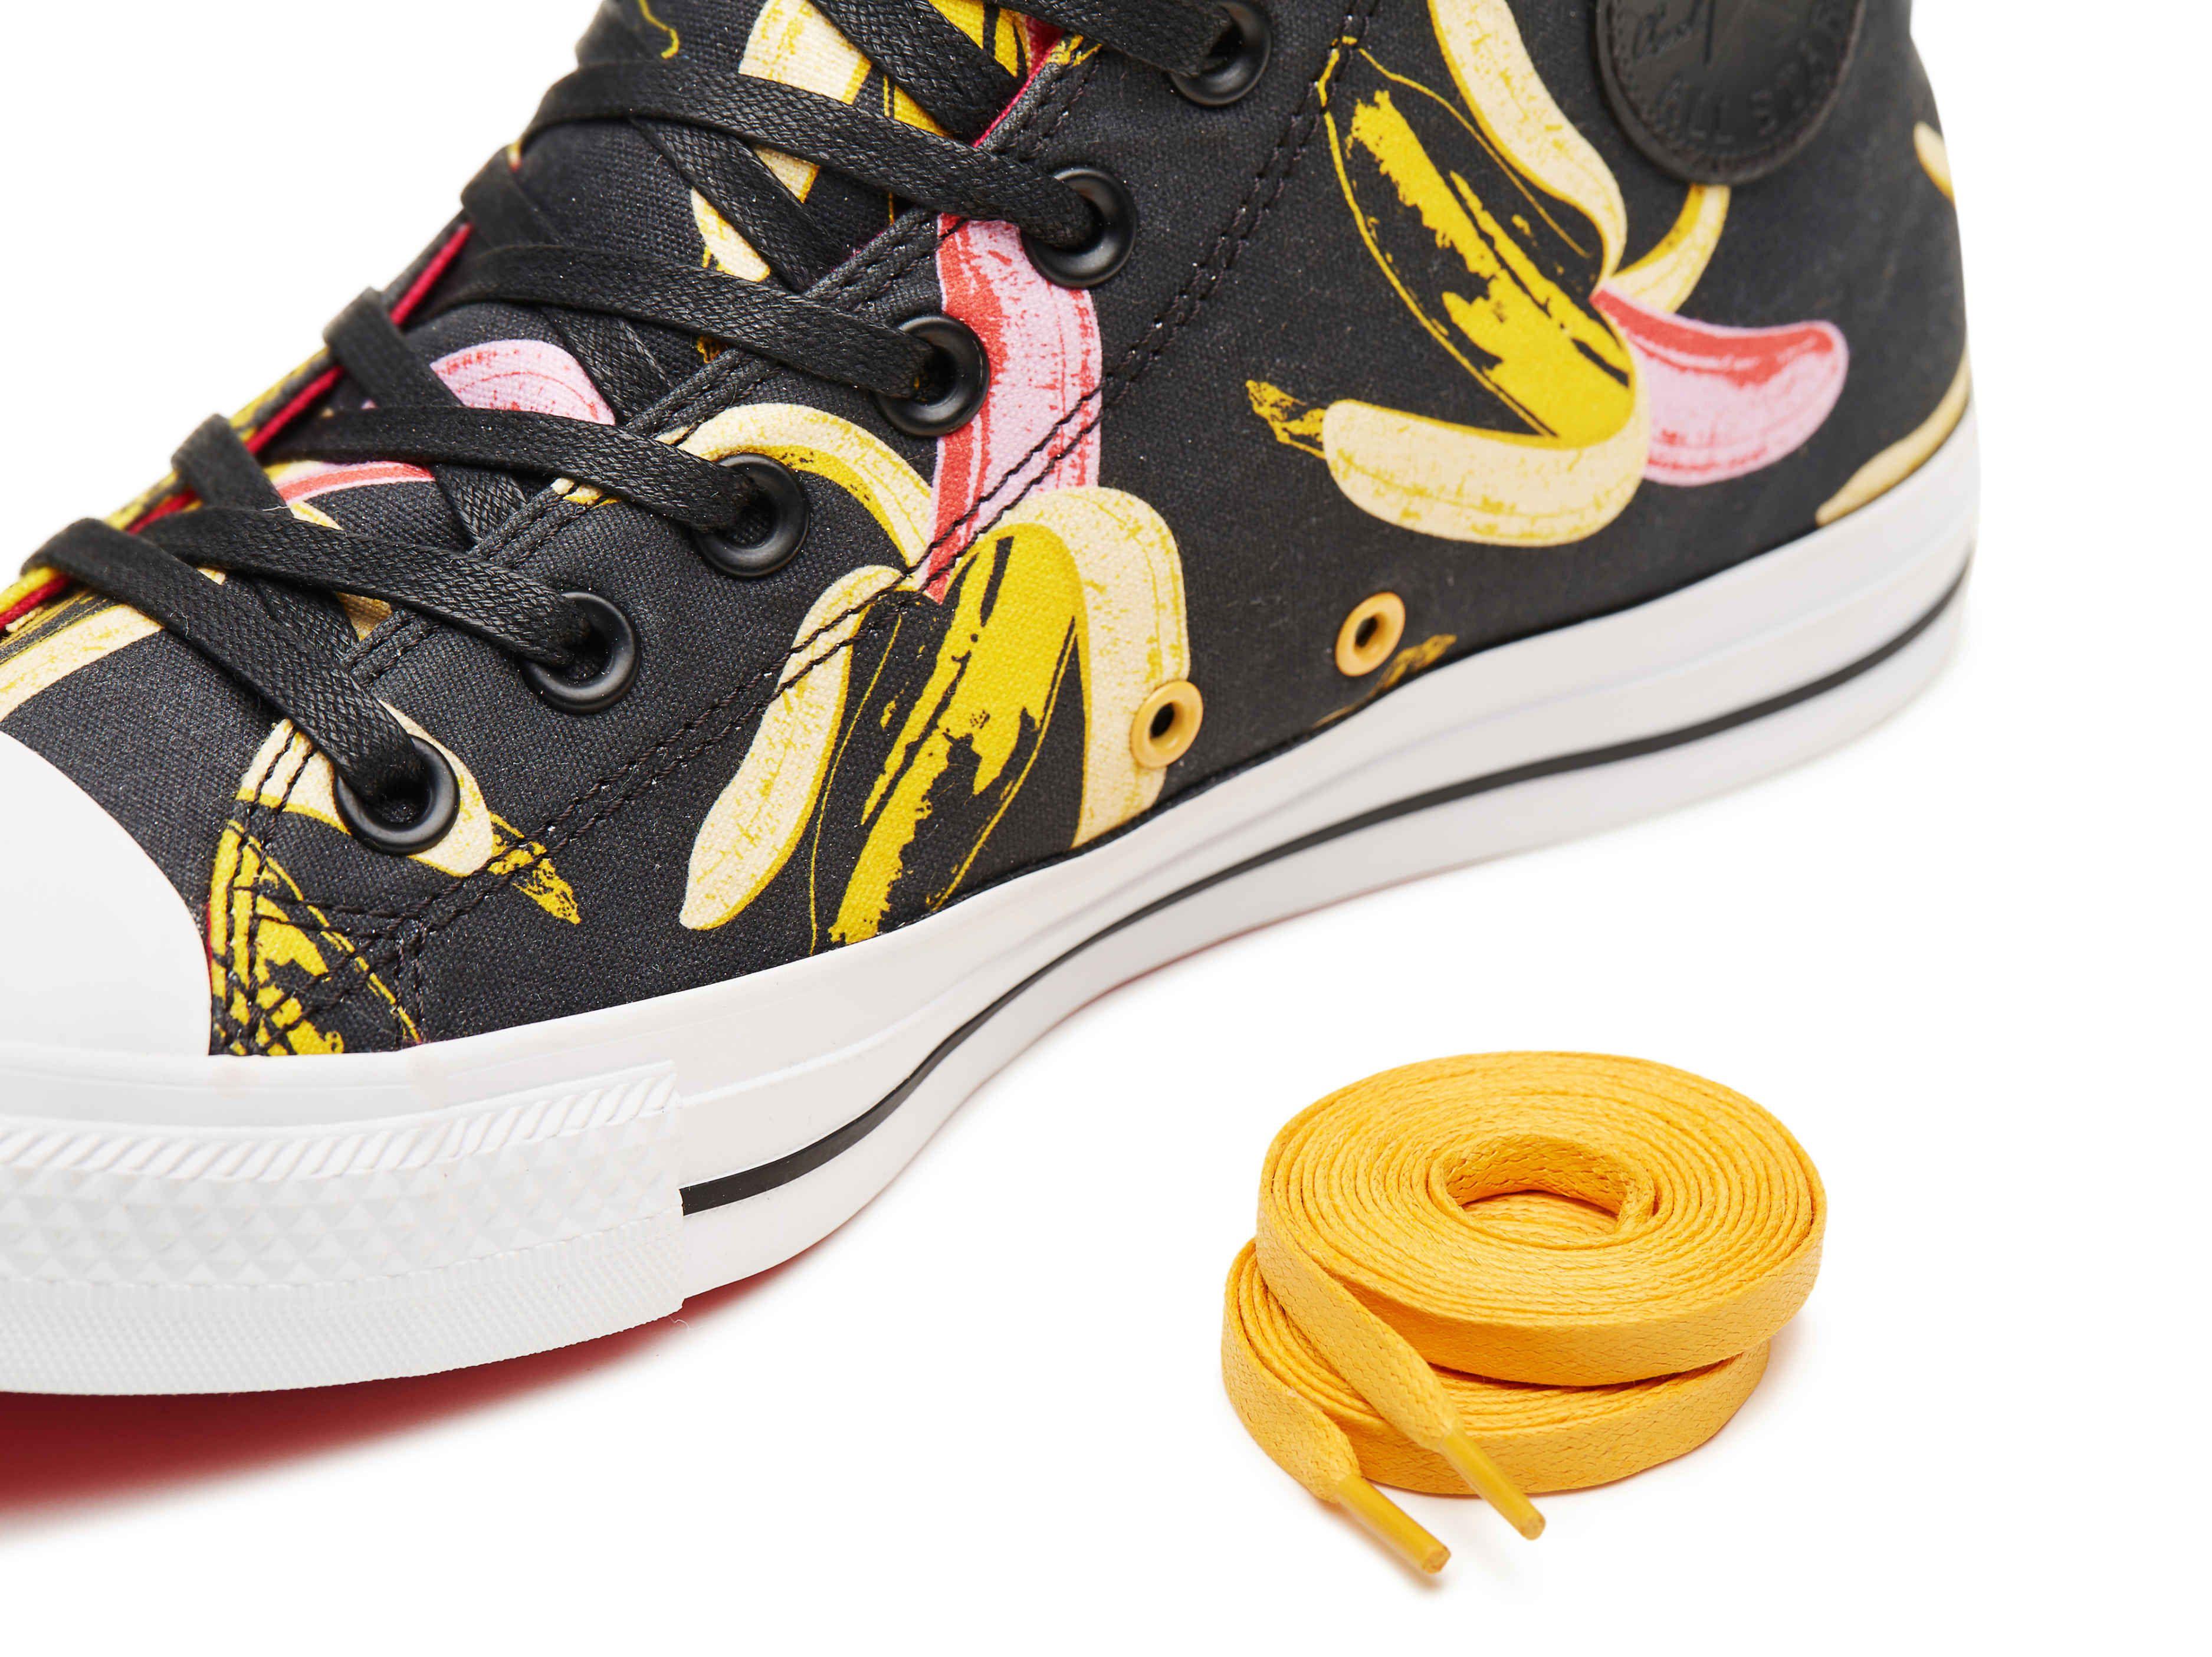 Converse & CLOT Unveil